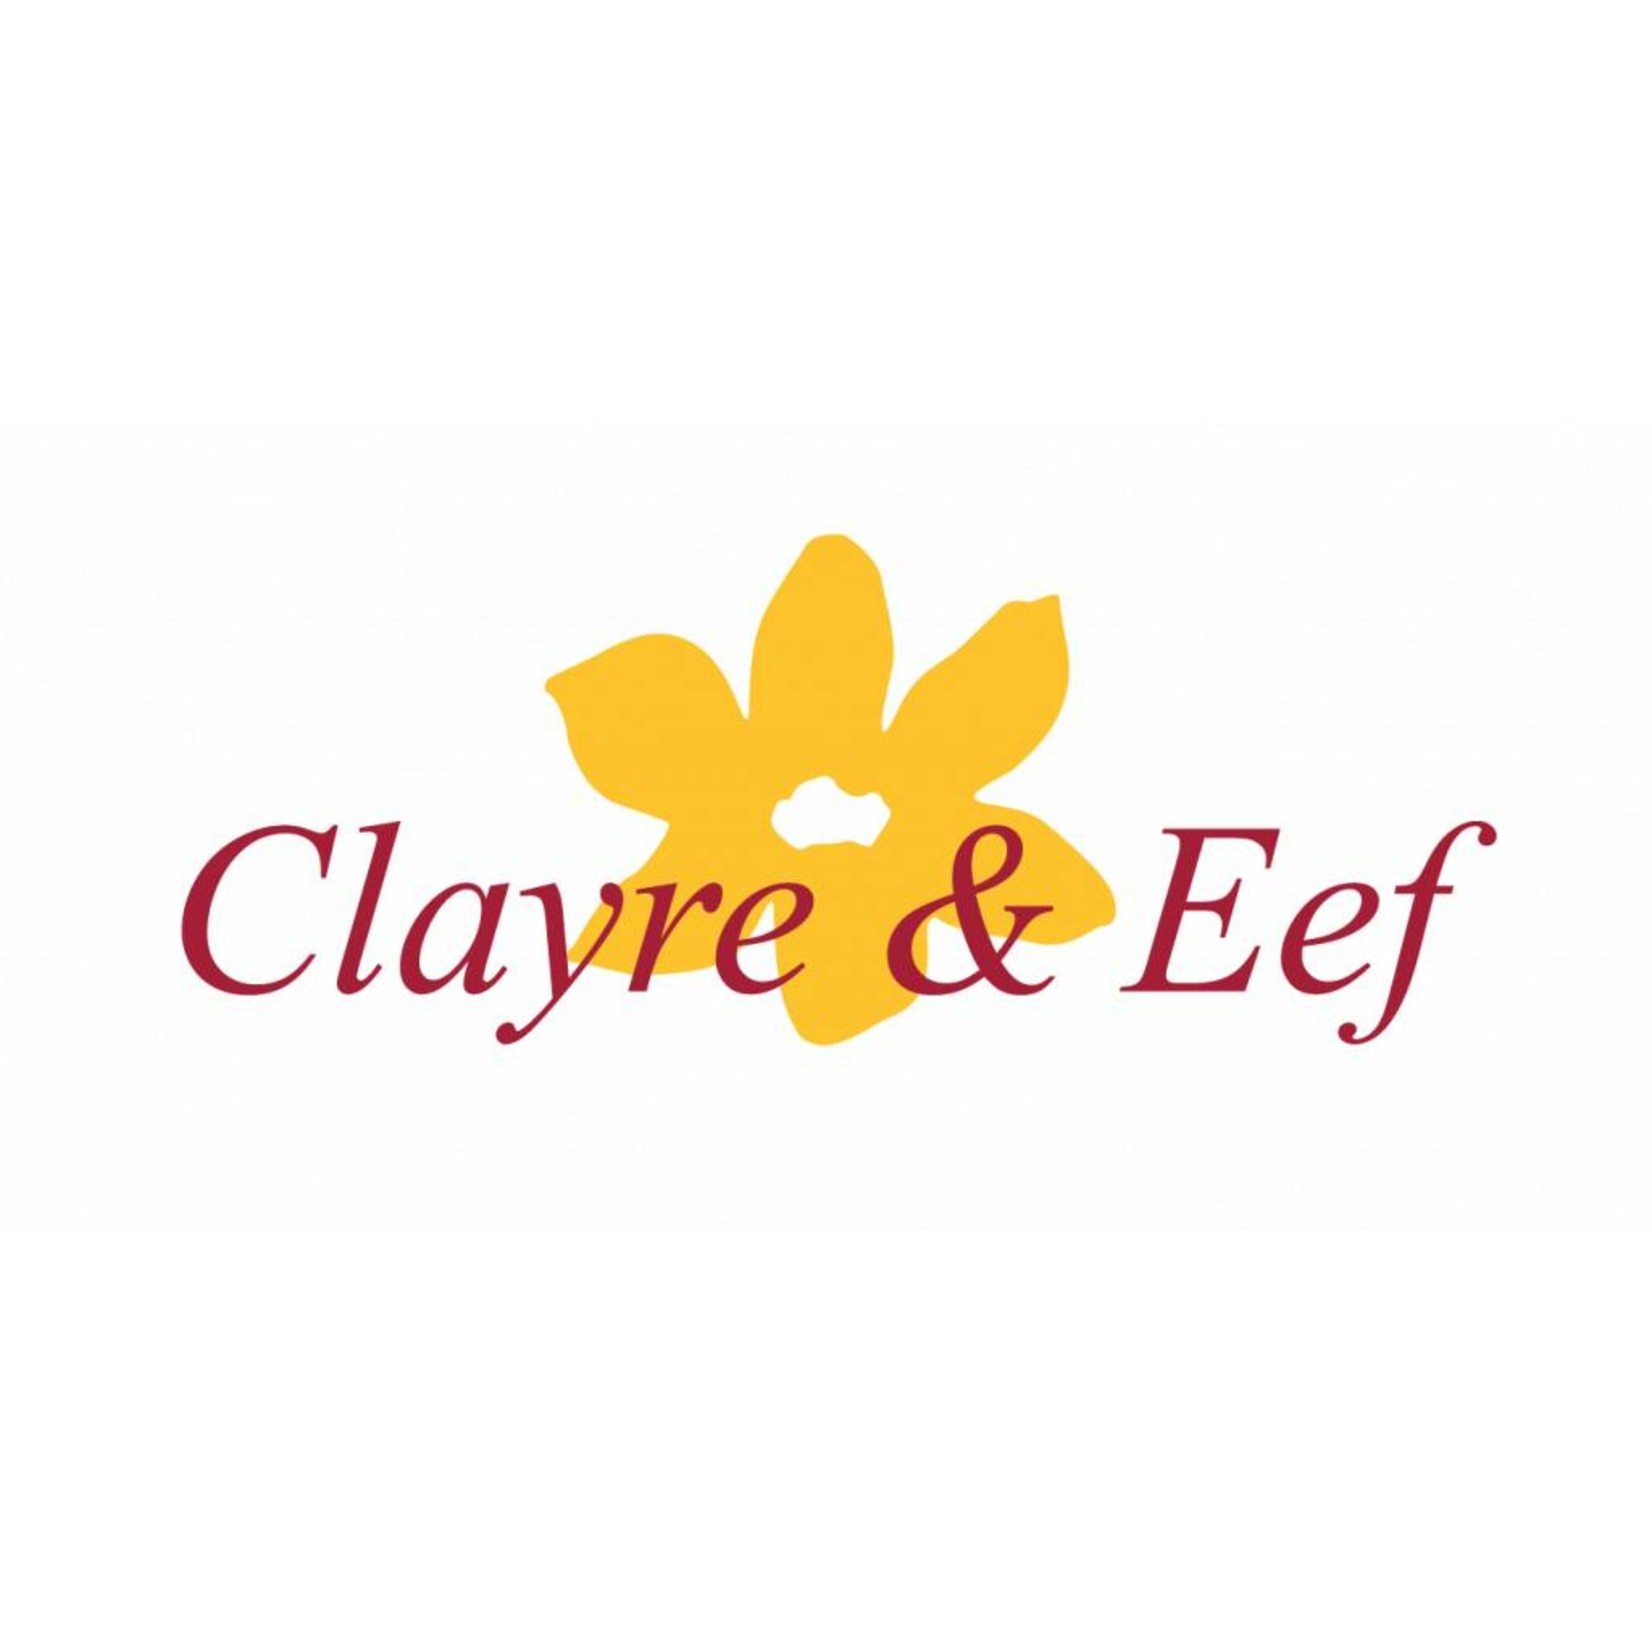 Clayre & Eef Clayre & Eef Tekstbord 30x40cm